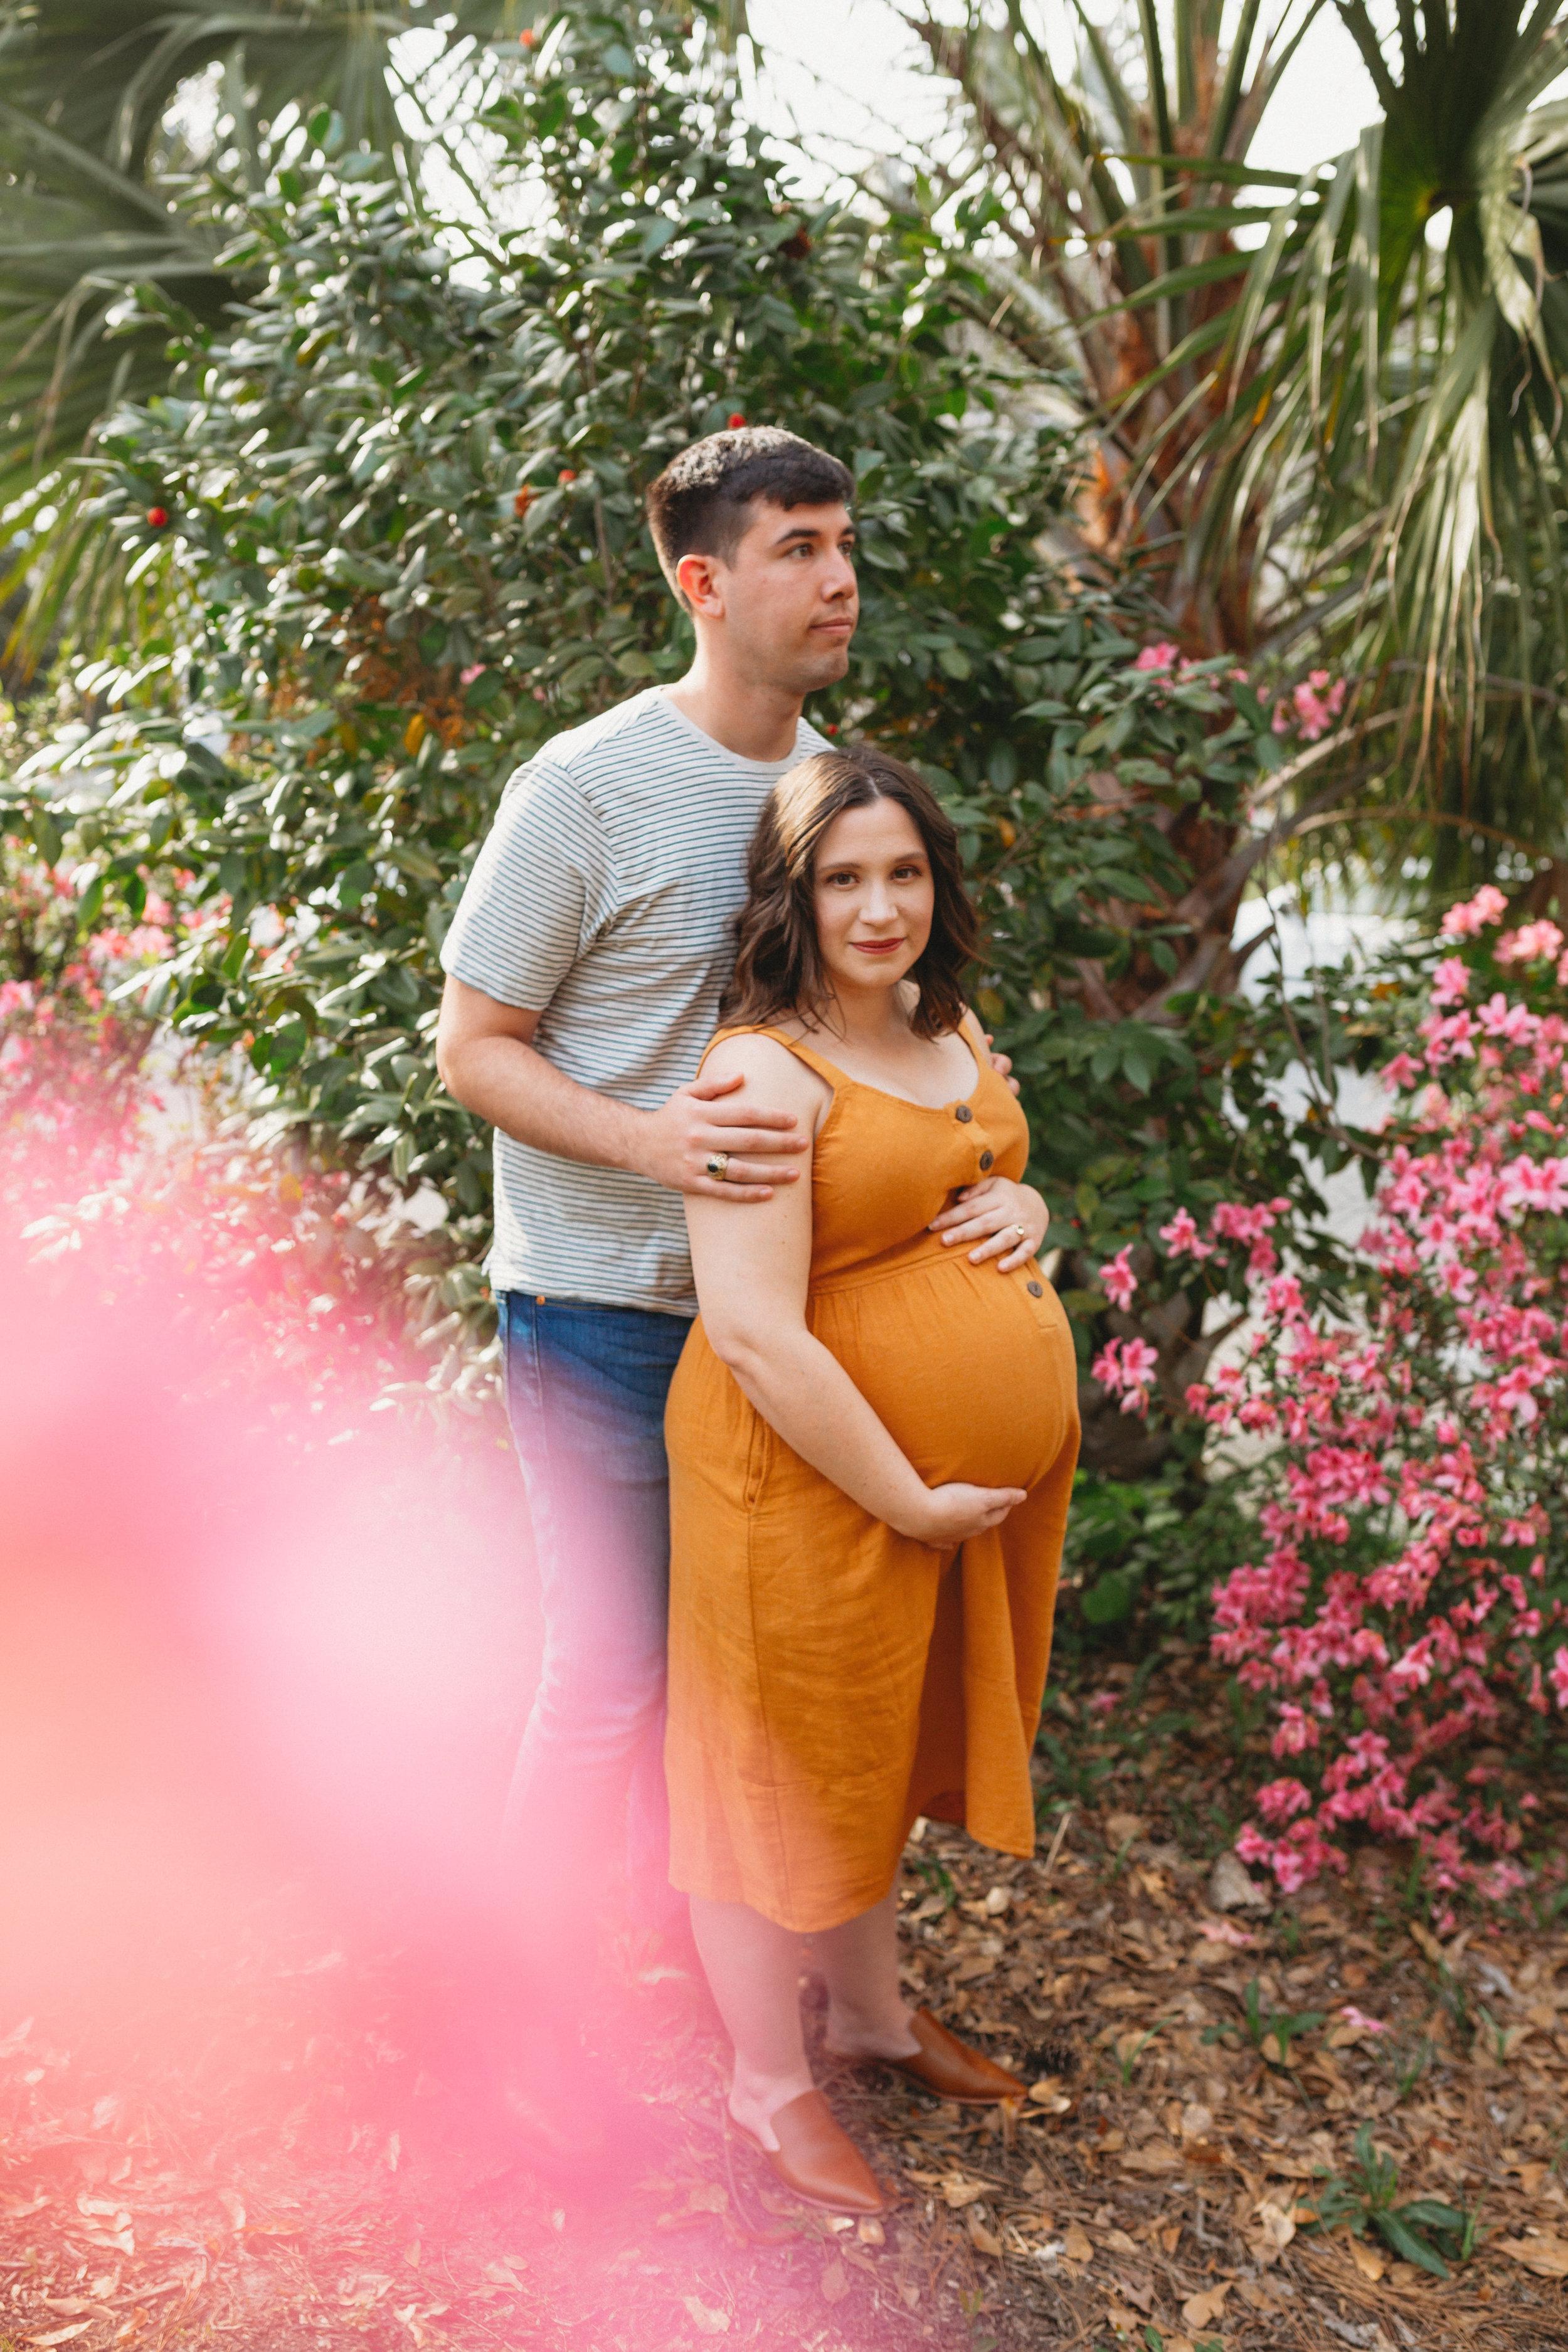 Secret Garden Maternity Photoshoot in Columbus, Georgia